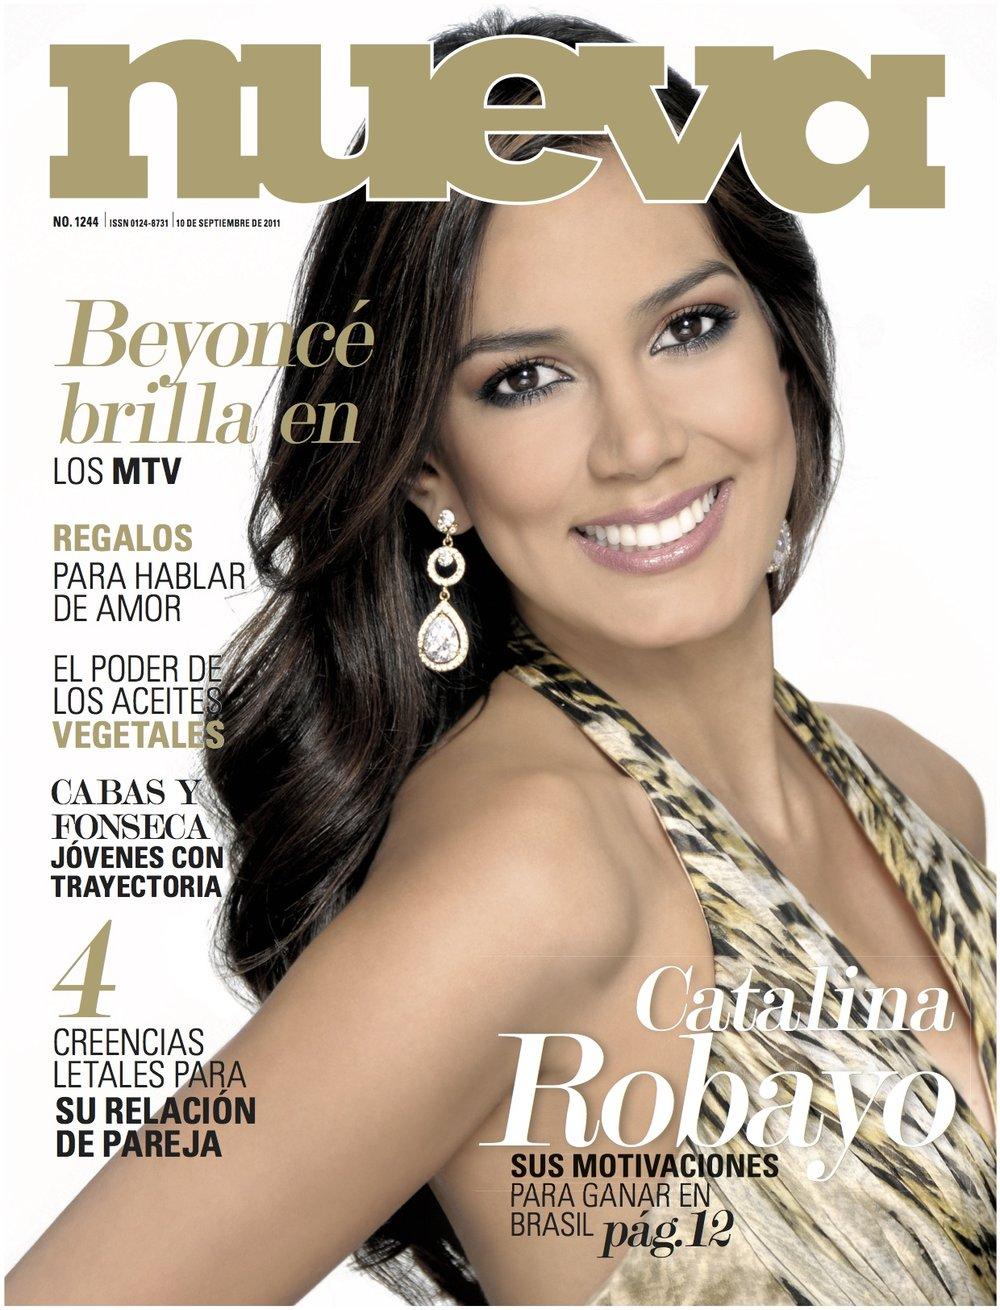 Revista Nueva 10 sep 11 - portada.jpg